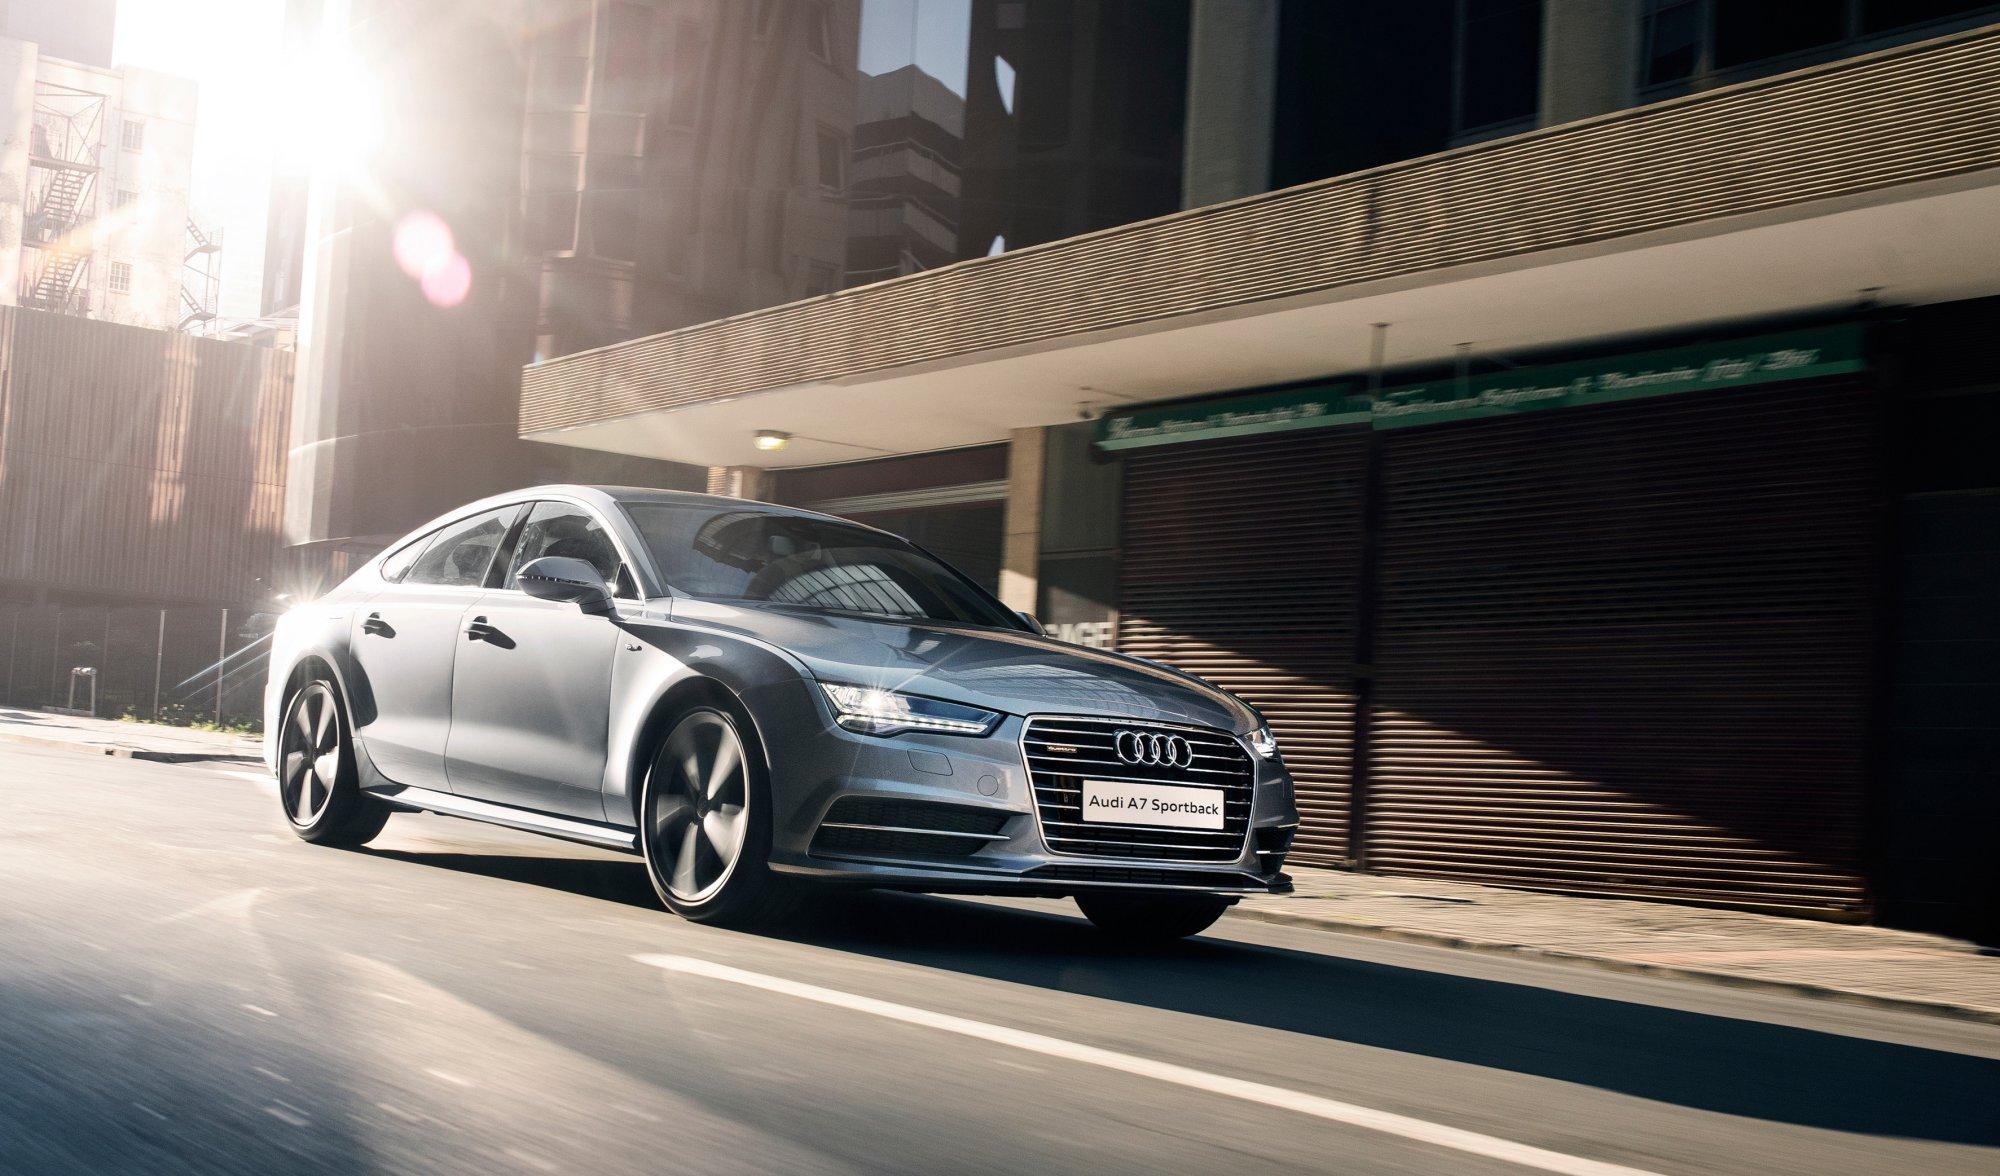 Range Rover Sport Back >> Review - 2017 Audi A7 Sportback - Review